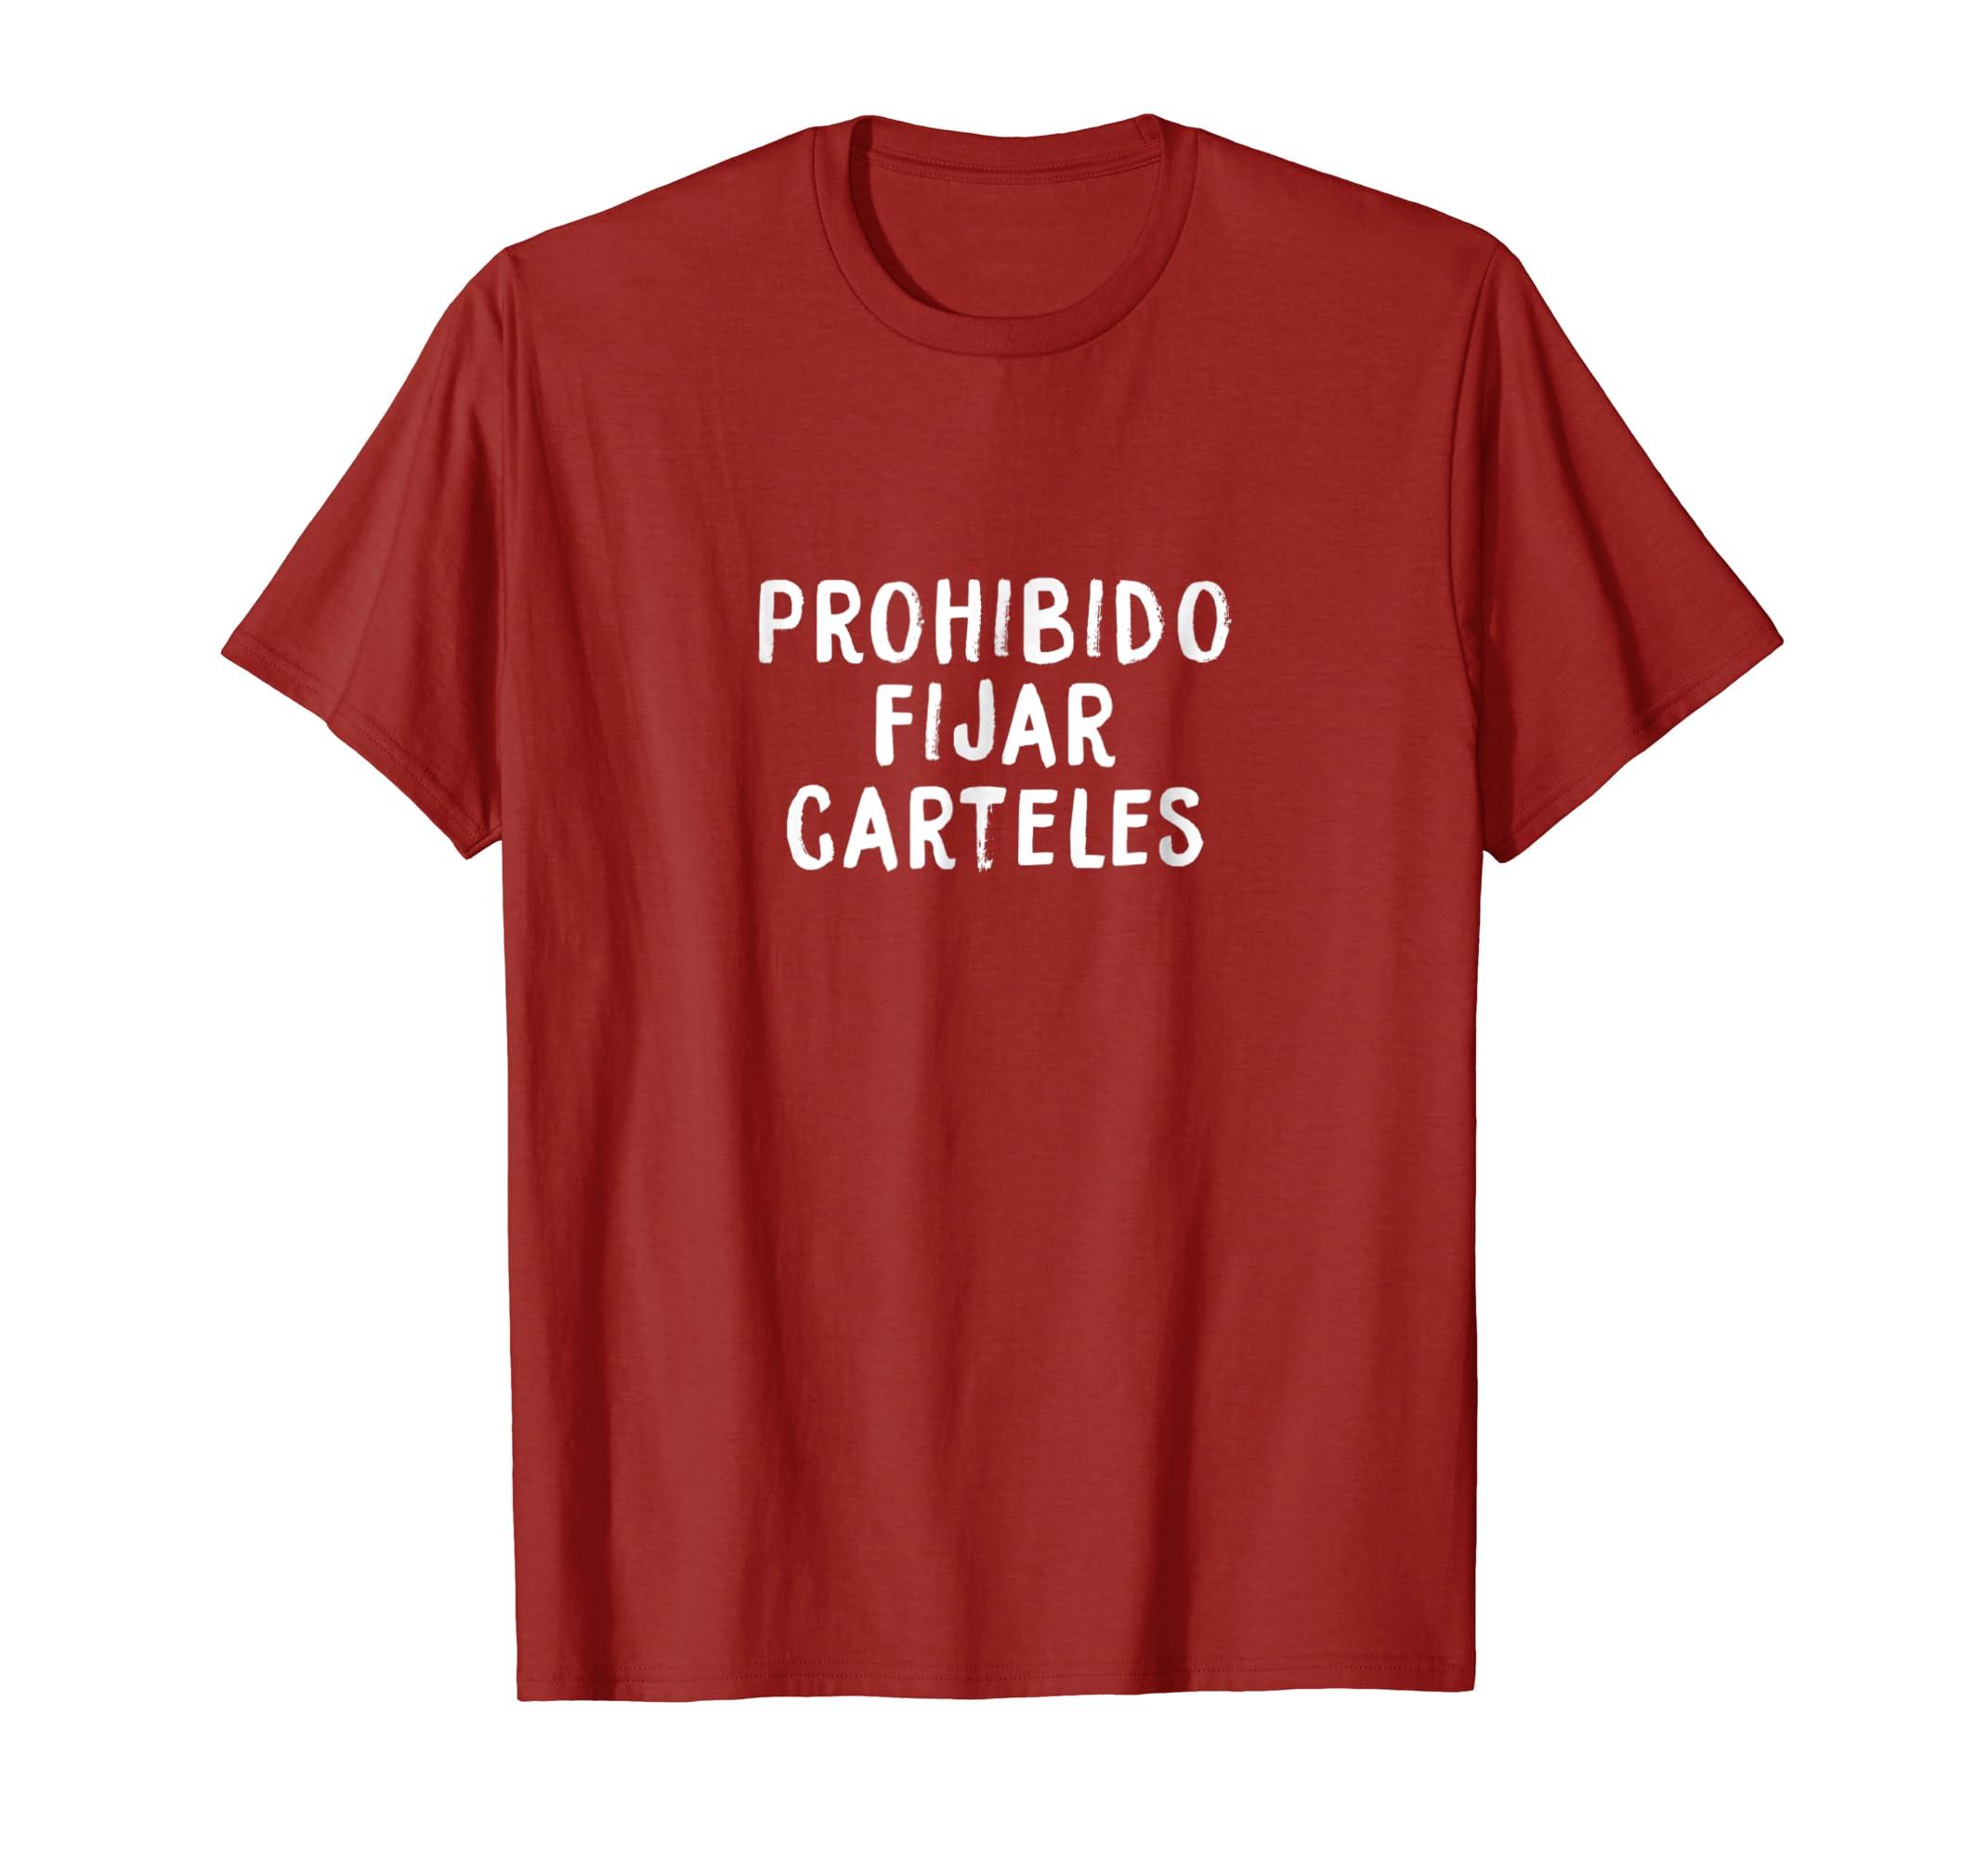 Amazon.com: Prohibido Fijar Carteles: Clothing